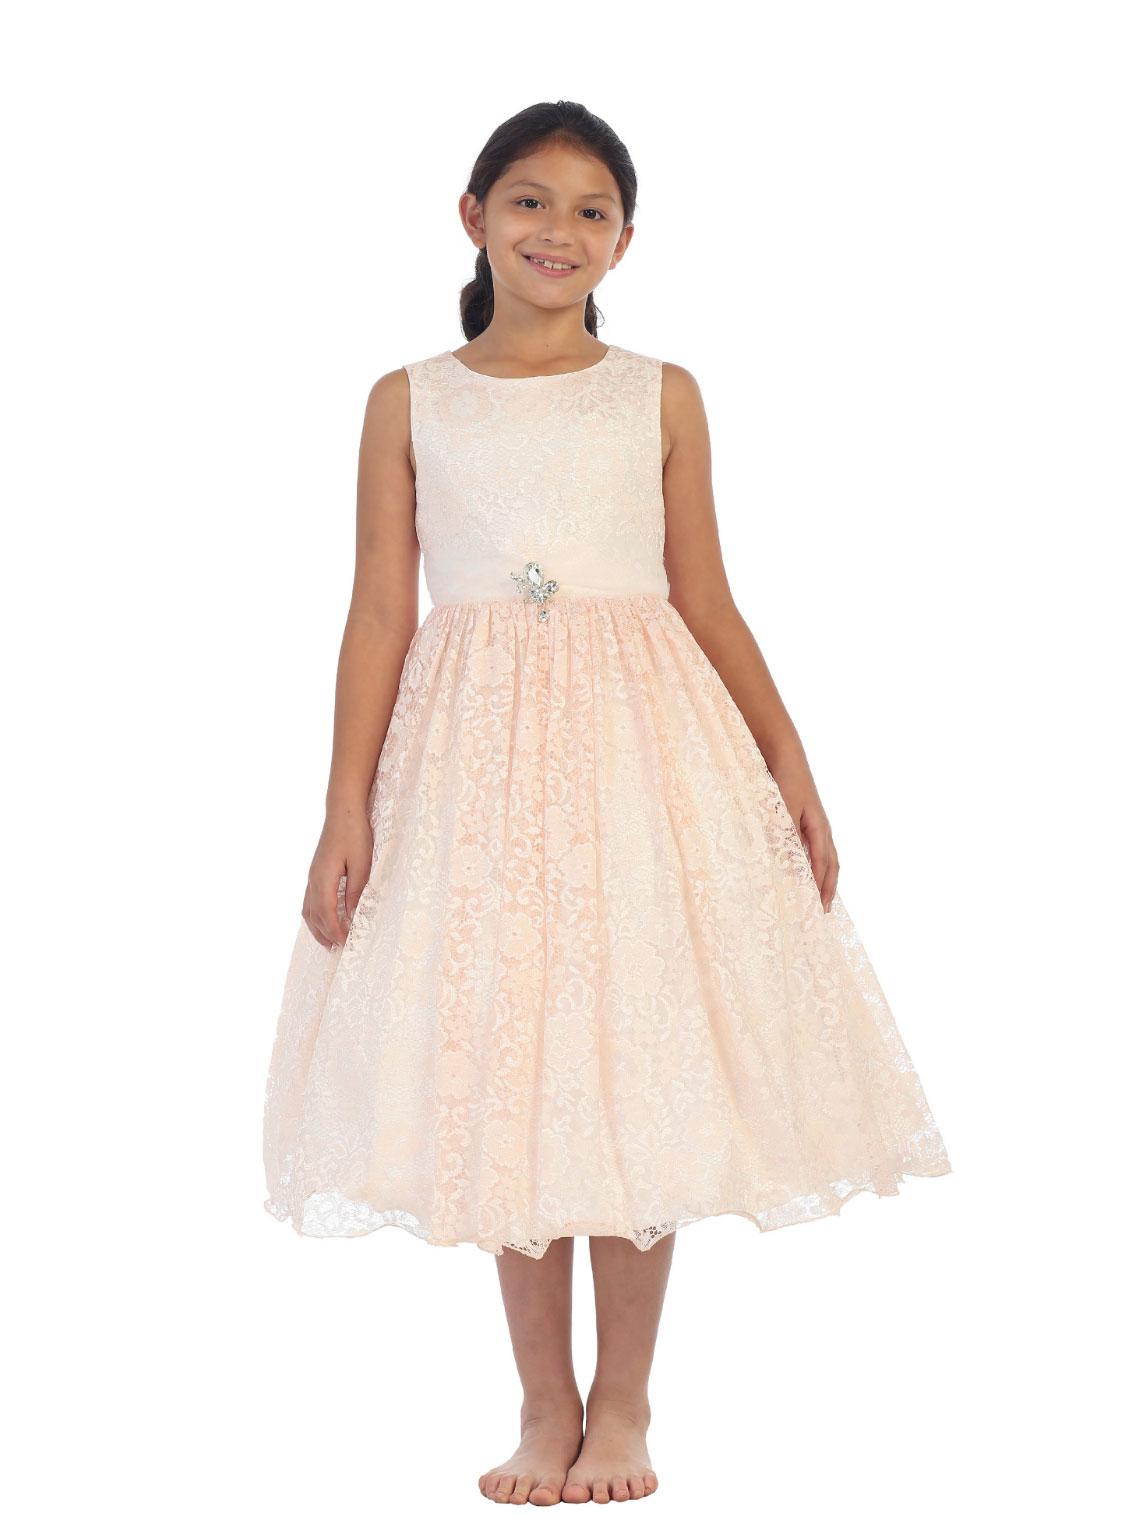 TT 5694BP Girls Dress Style 5694 BLUSH PINK Sleeveless Floral Lace Dress